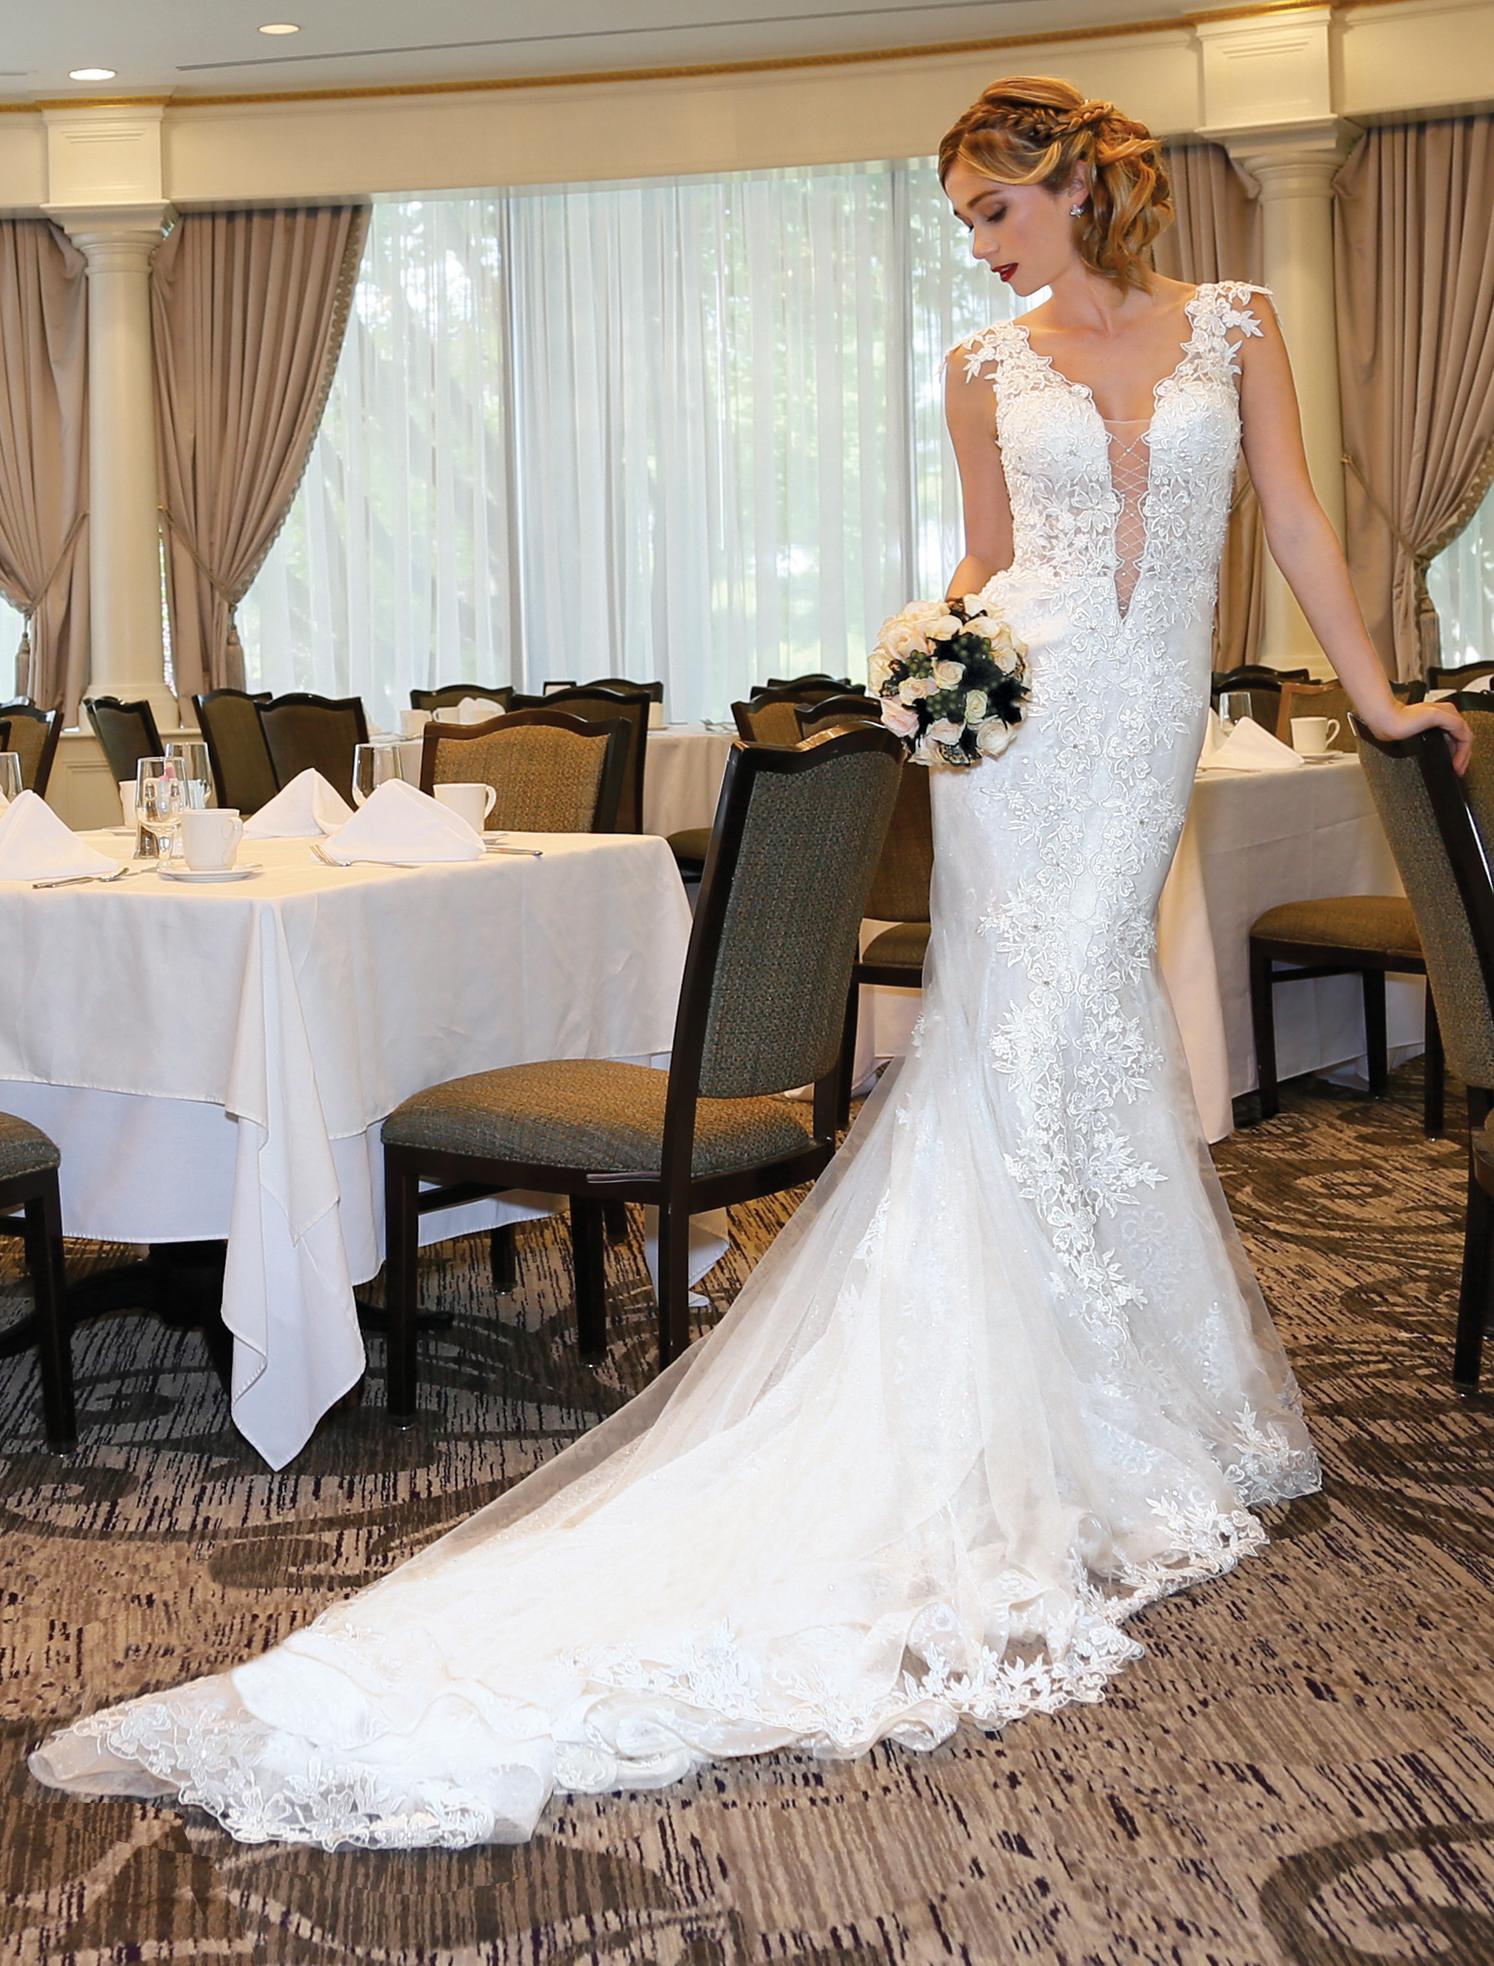 6573637ebd53 Trumpet Bridal Wedding Gown by Eve of Milady - NY, NJ